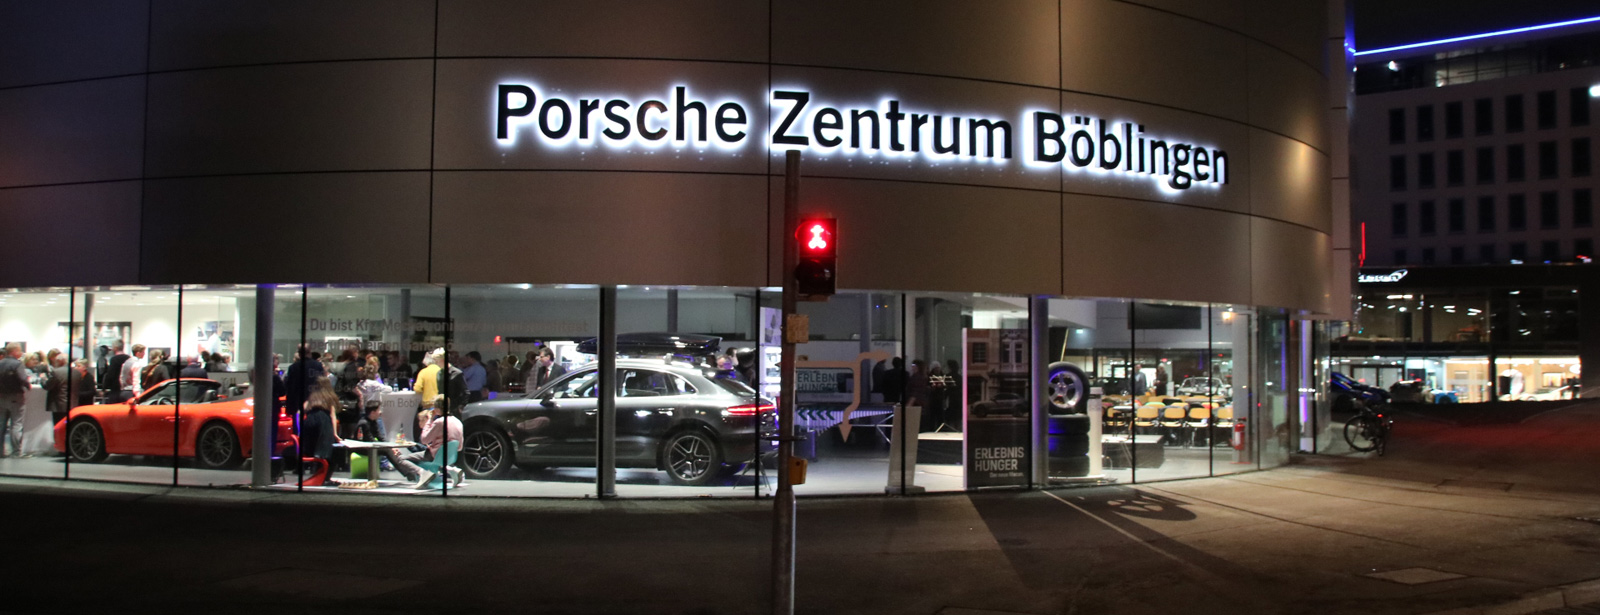 Porsche zentrum b blingen events 2019 for Porsche zentrum boblingen